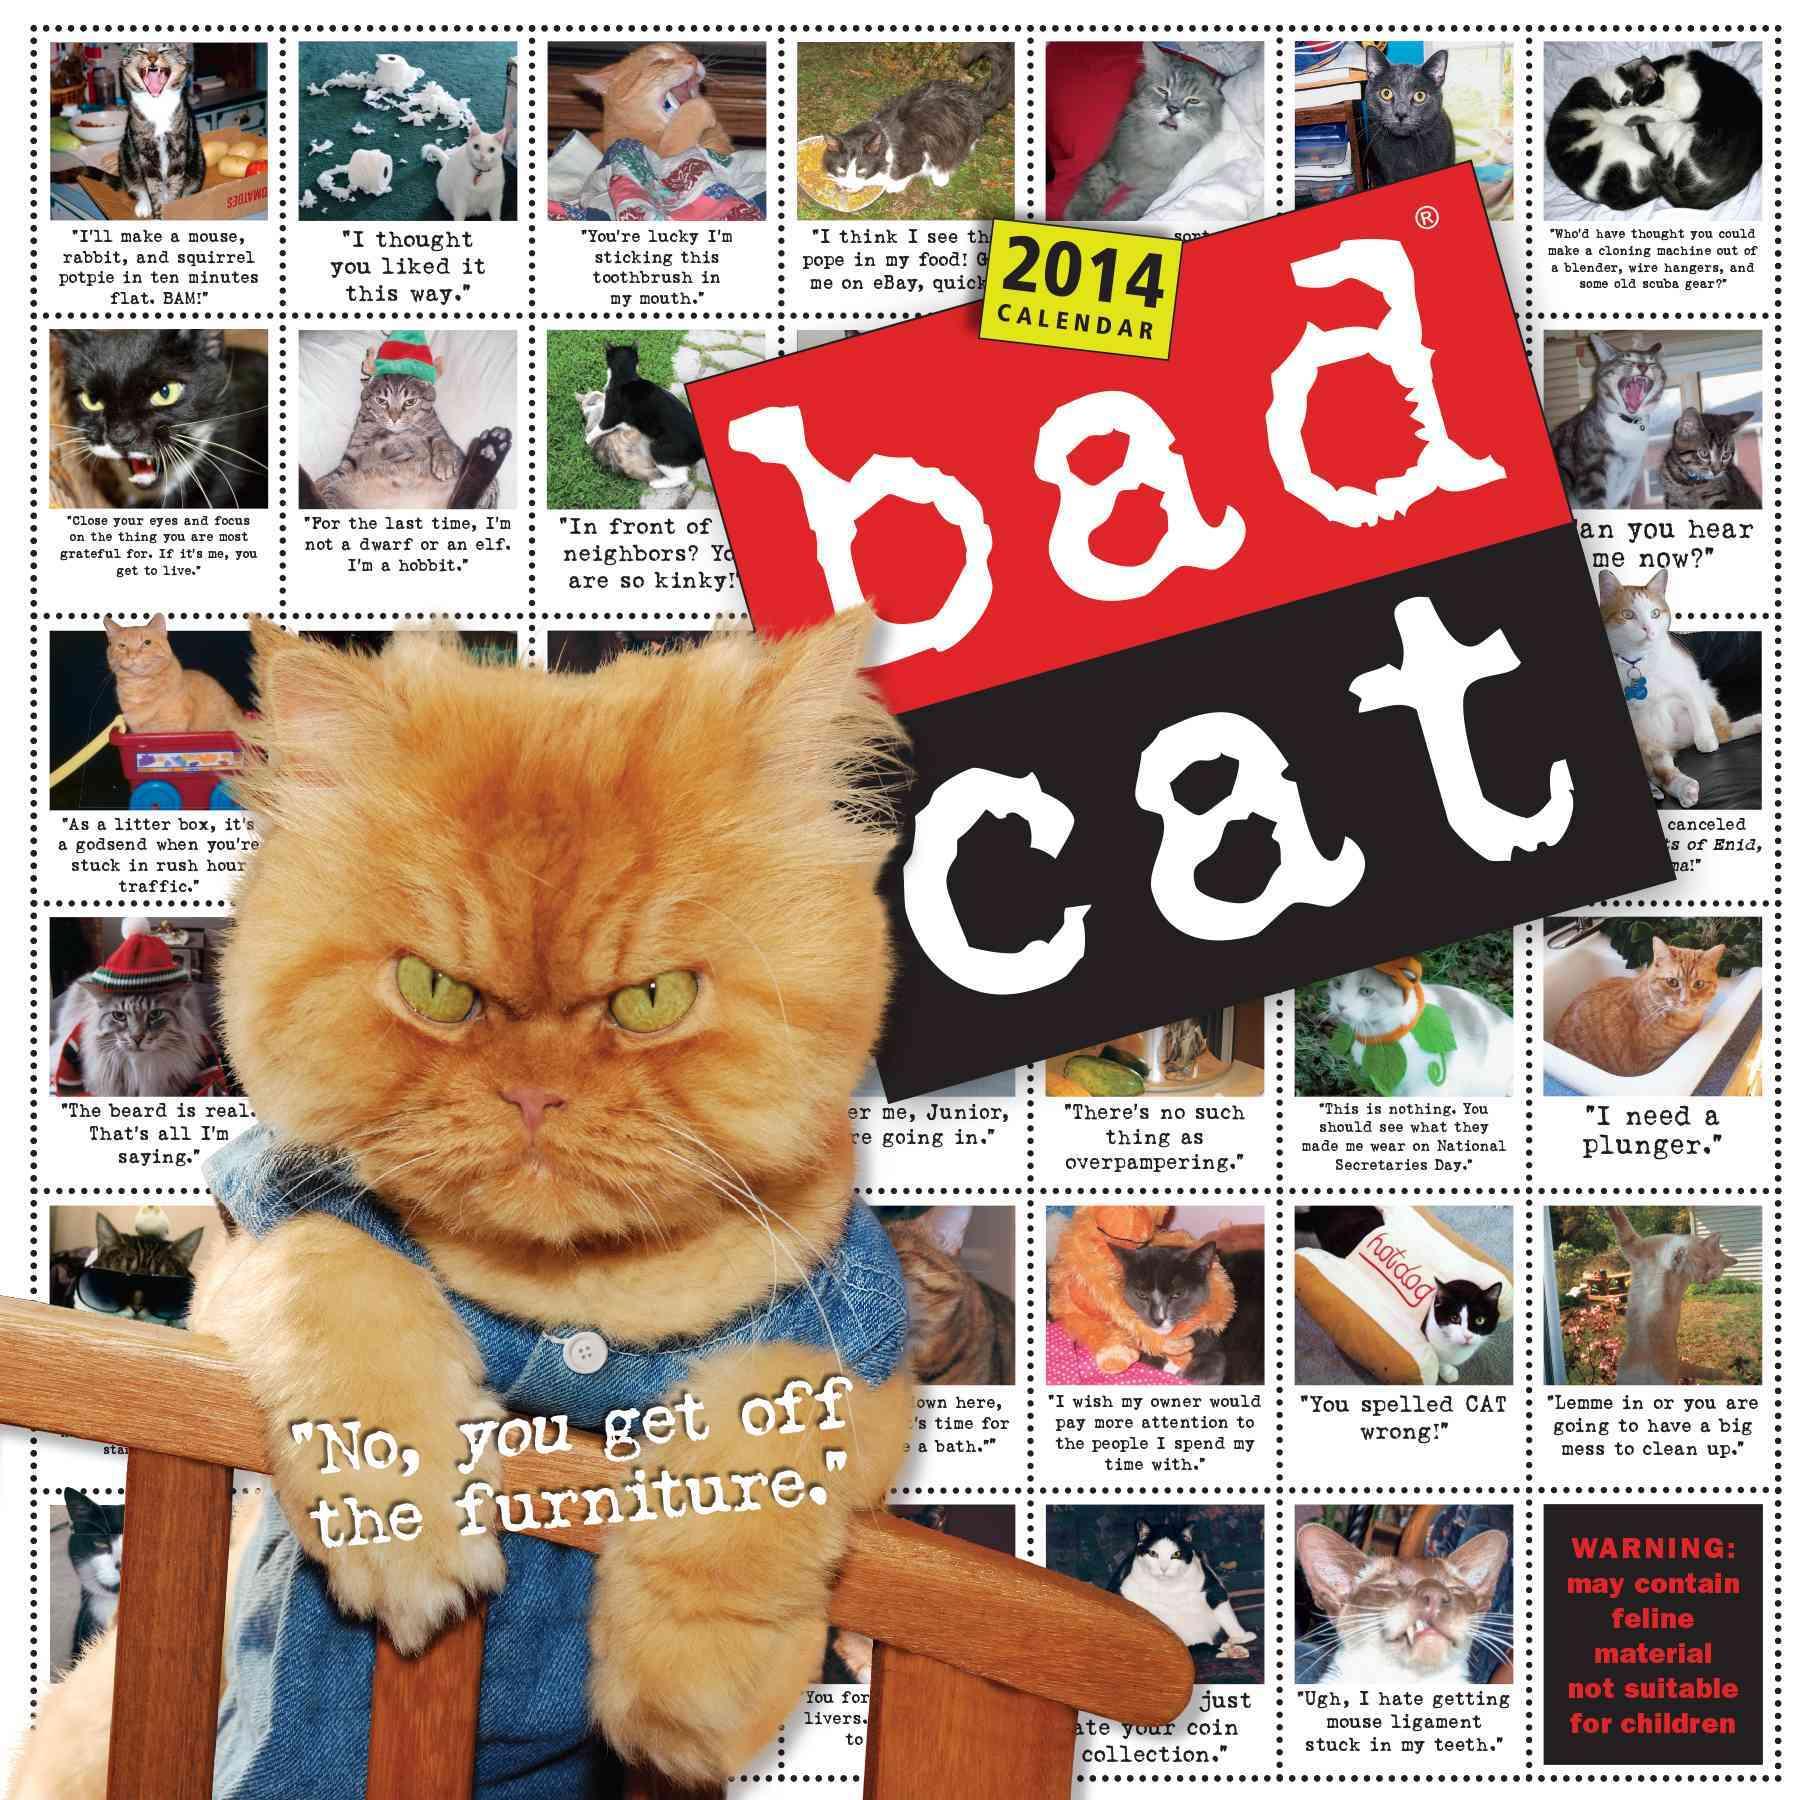 Bad Cat 2014 Calendar (Calendar)